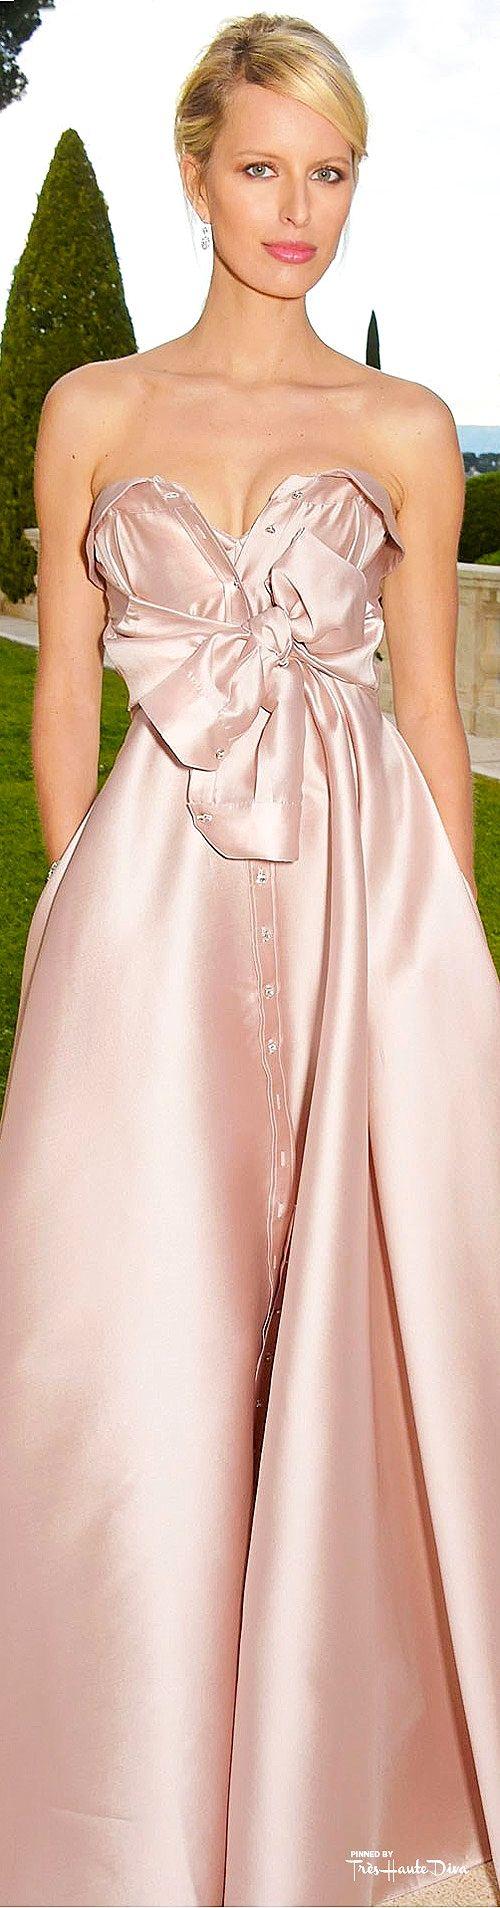 #Karolina #Kurkova in Alexis Mabille Couture ♔ Cannes Film Festival 2015 Red Carpet ♔ Très Haute Diva ♔